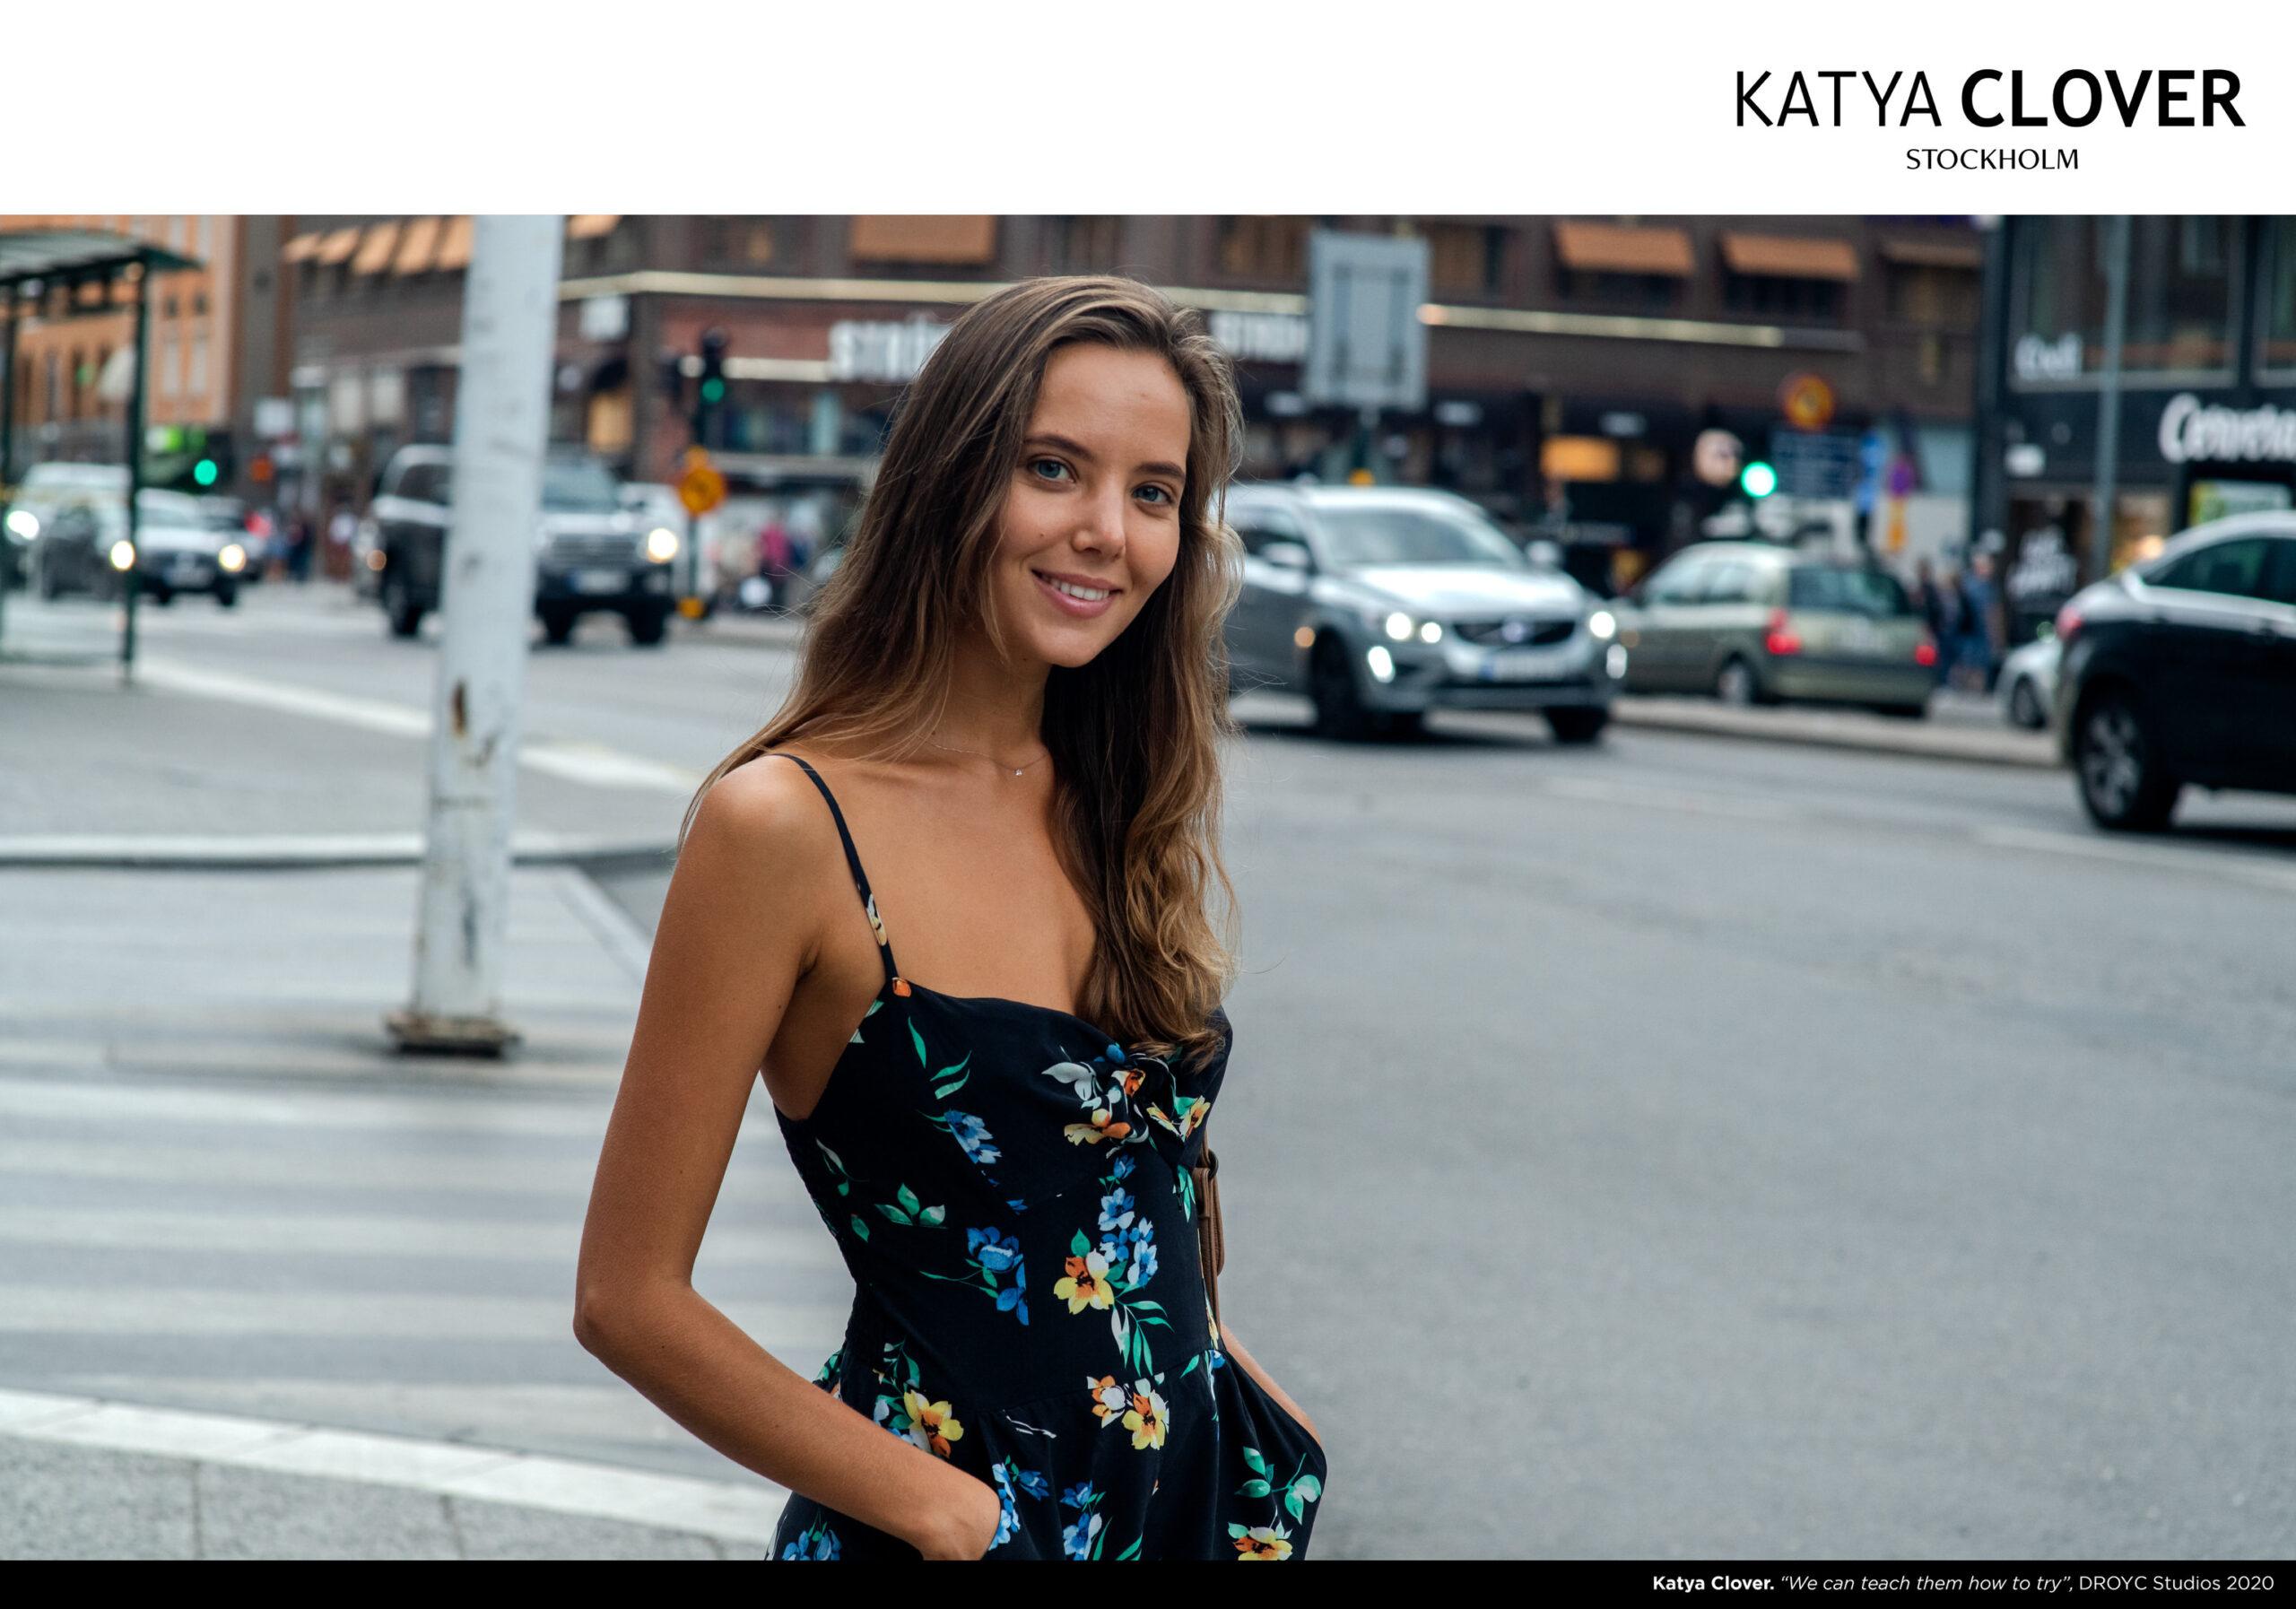 KatyaClover-DROYC-We_can_teach_them_how_to_try-26b